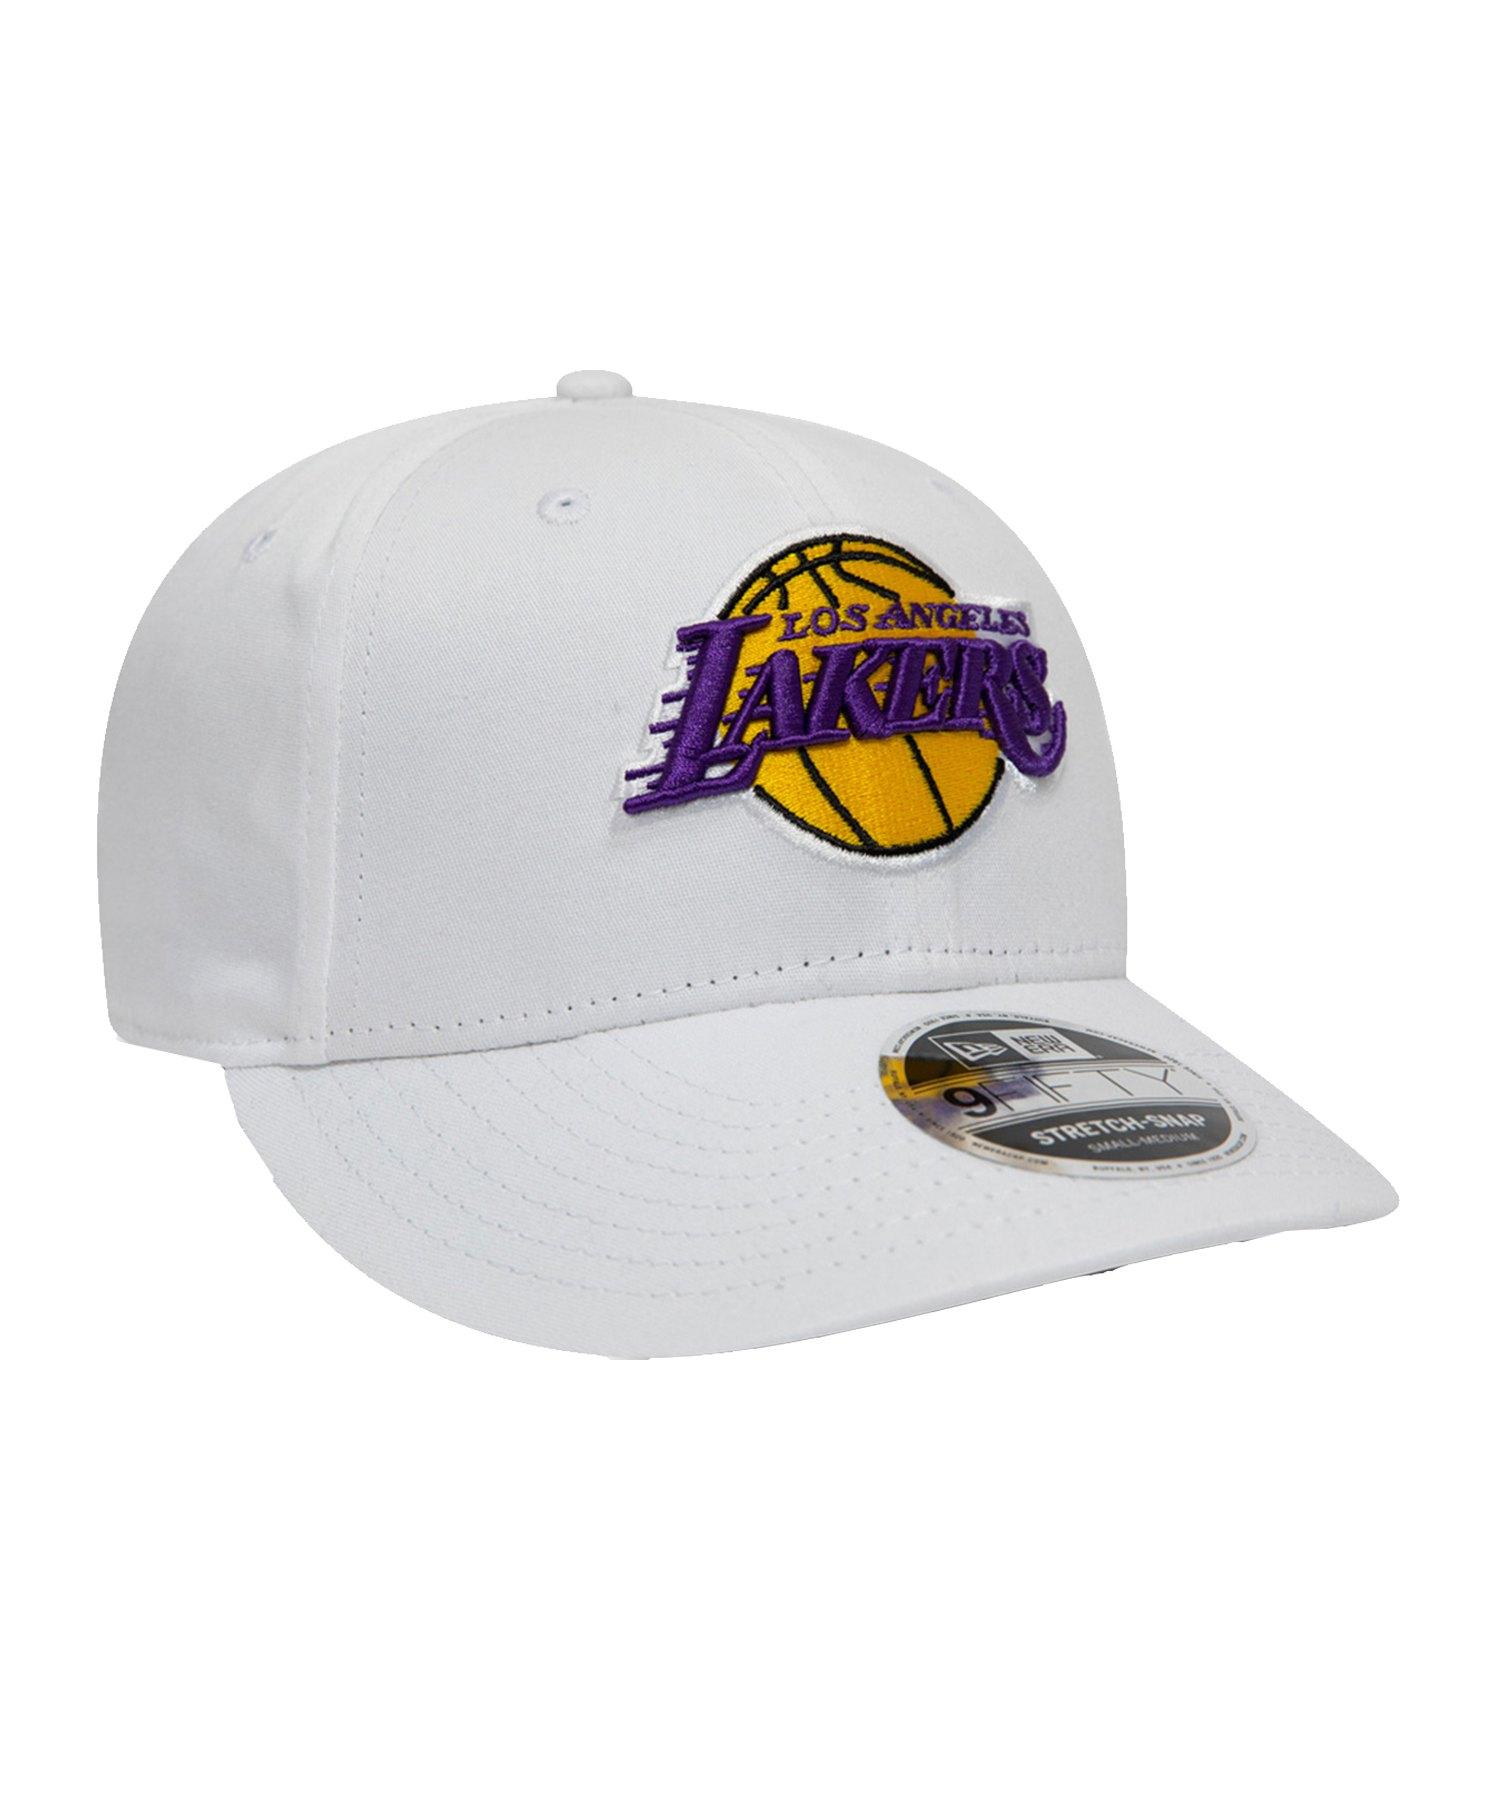 New Era LA Lakers 9Fifty Cap Weiss - weiss